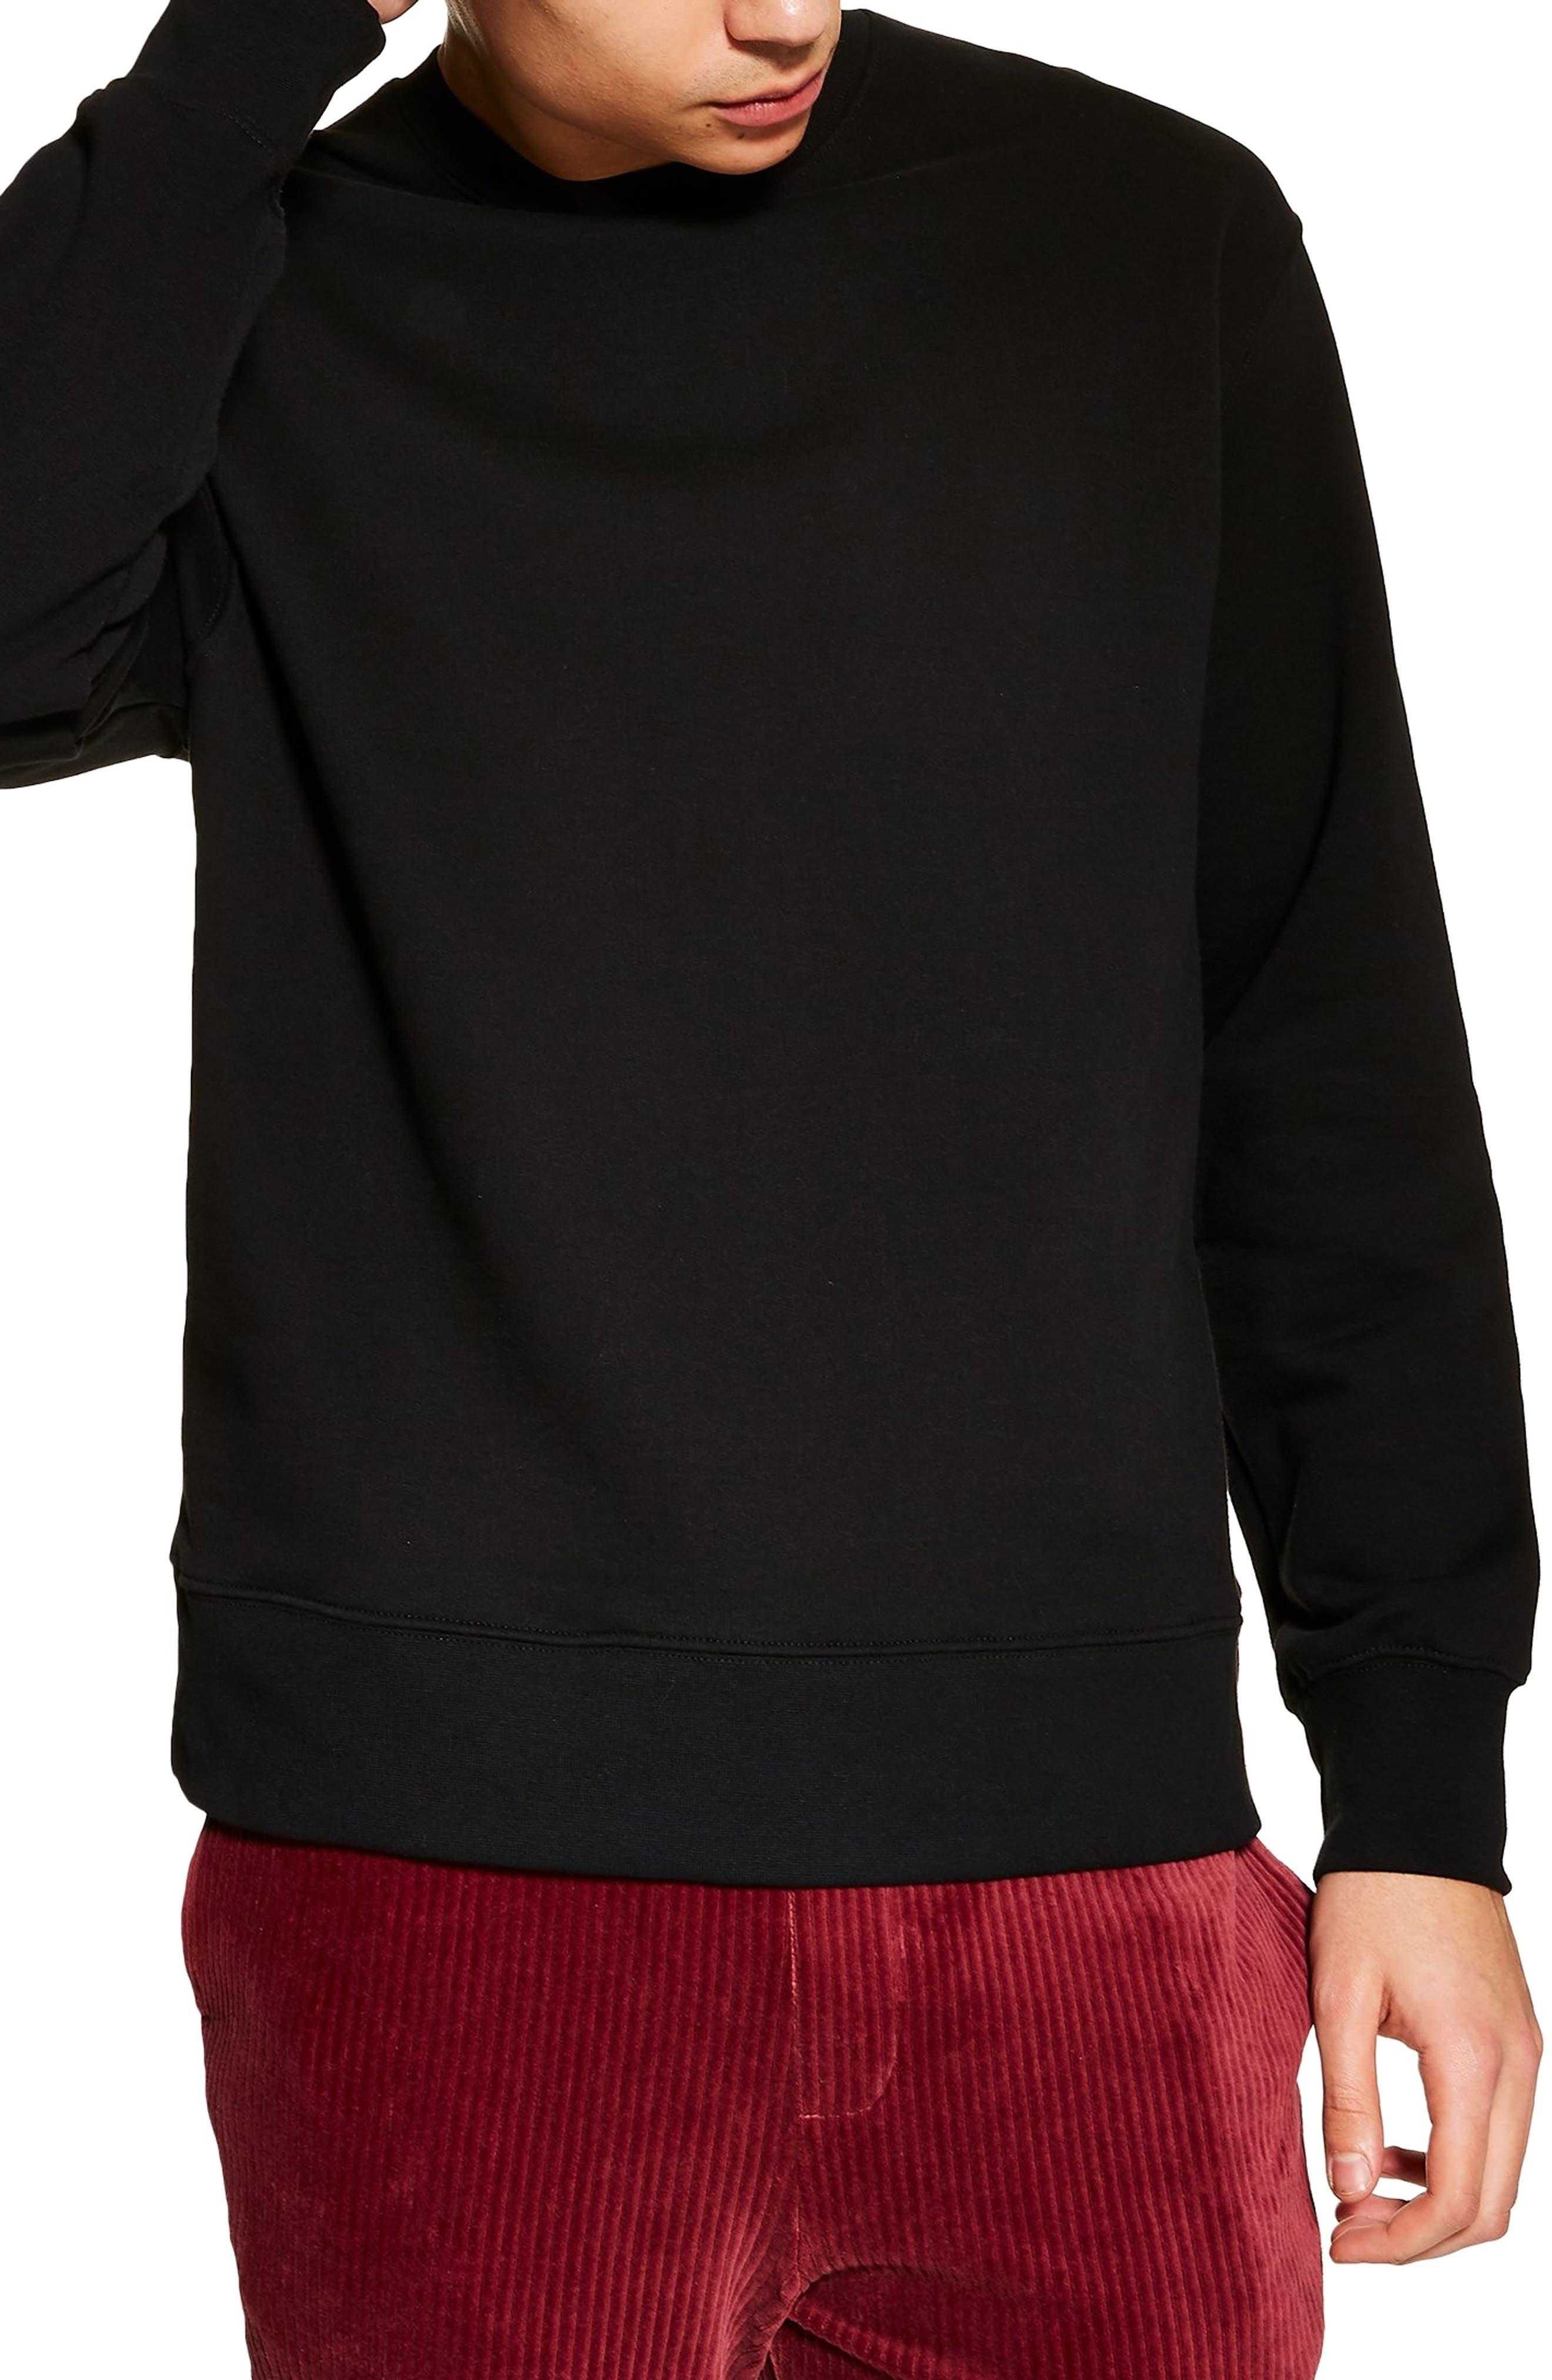 TOPMAN Crewneck Sweatshirt, Main, color, BLACK